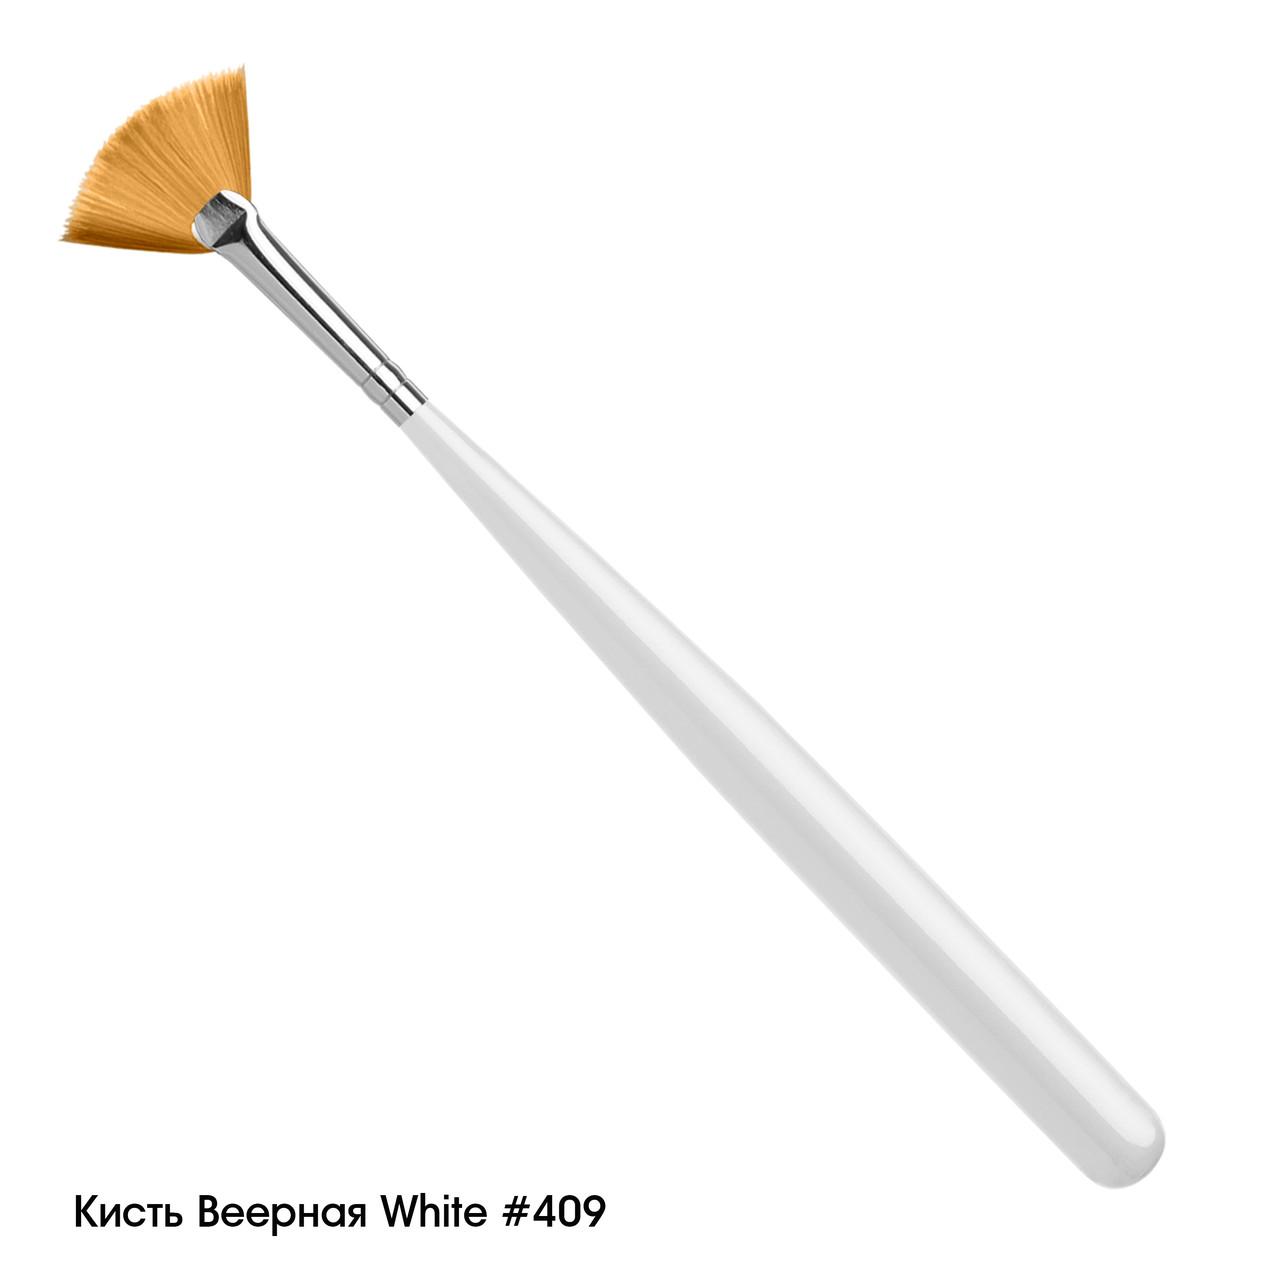 Кисть Веерная White